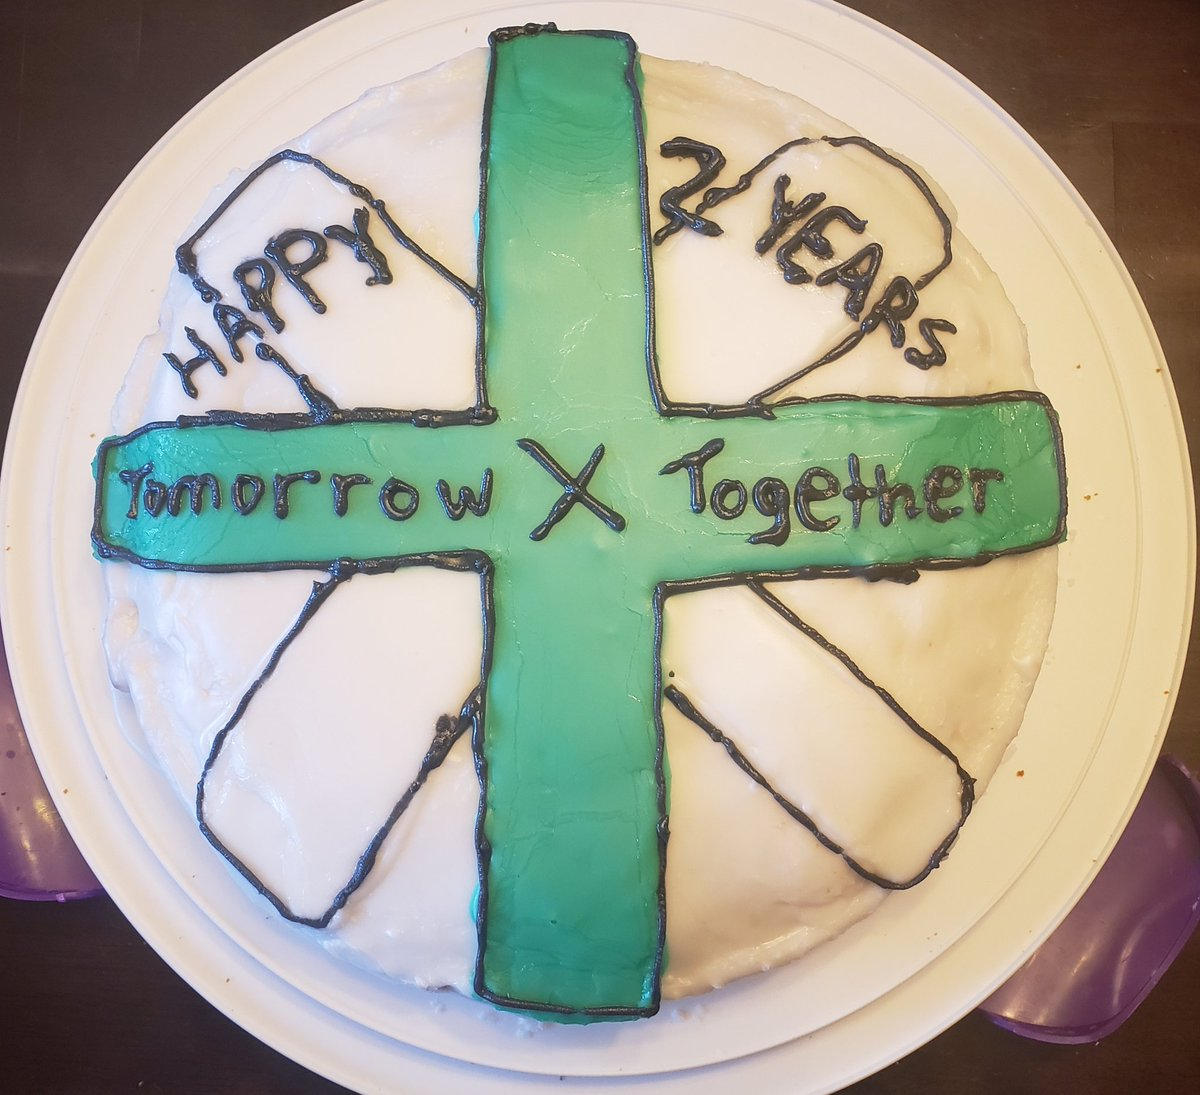 Pre-Concert Snacks And Cake!! ❤ #SHINExTOGETHER  #밝게_빛날_우리들의_두번째_축제  @TXT_members @TXT_bighit #TXT #TOMORROW_X_TOGETHER  #투모로우바이투게더